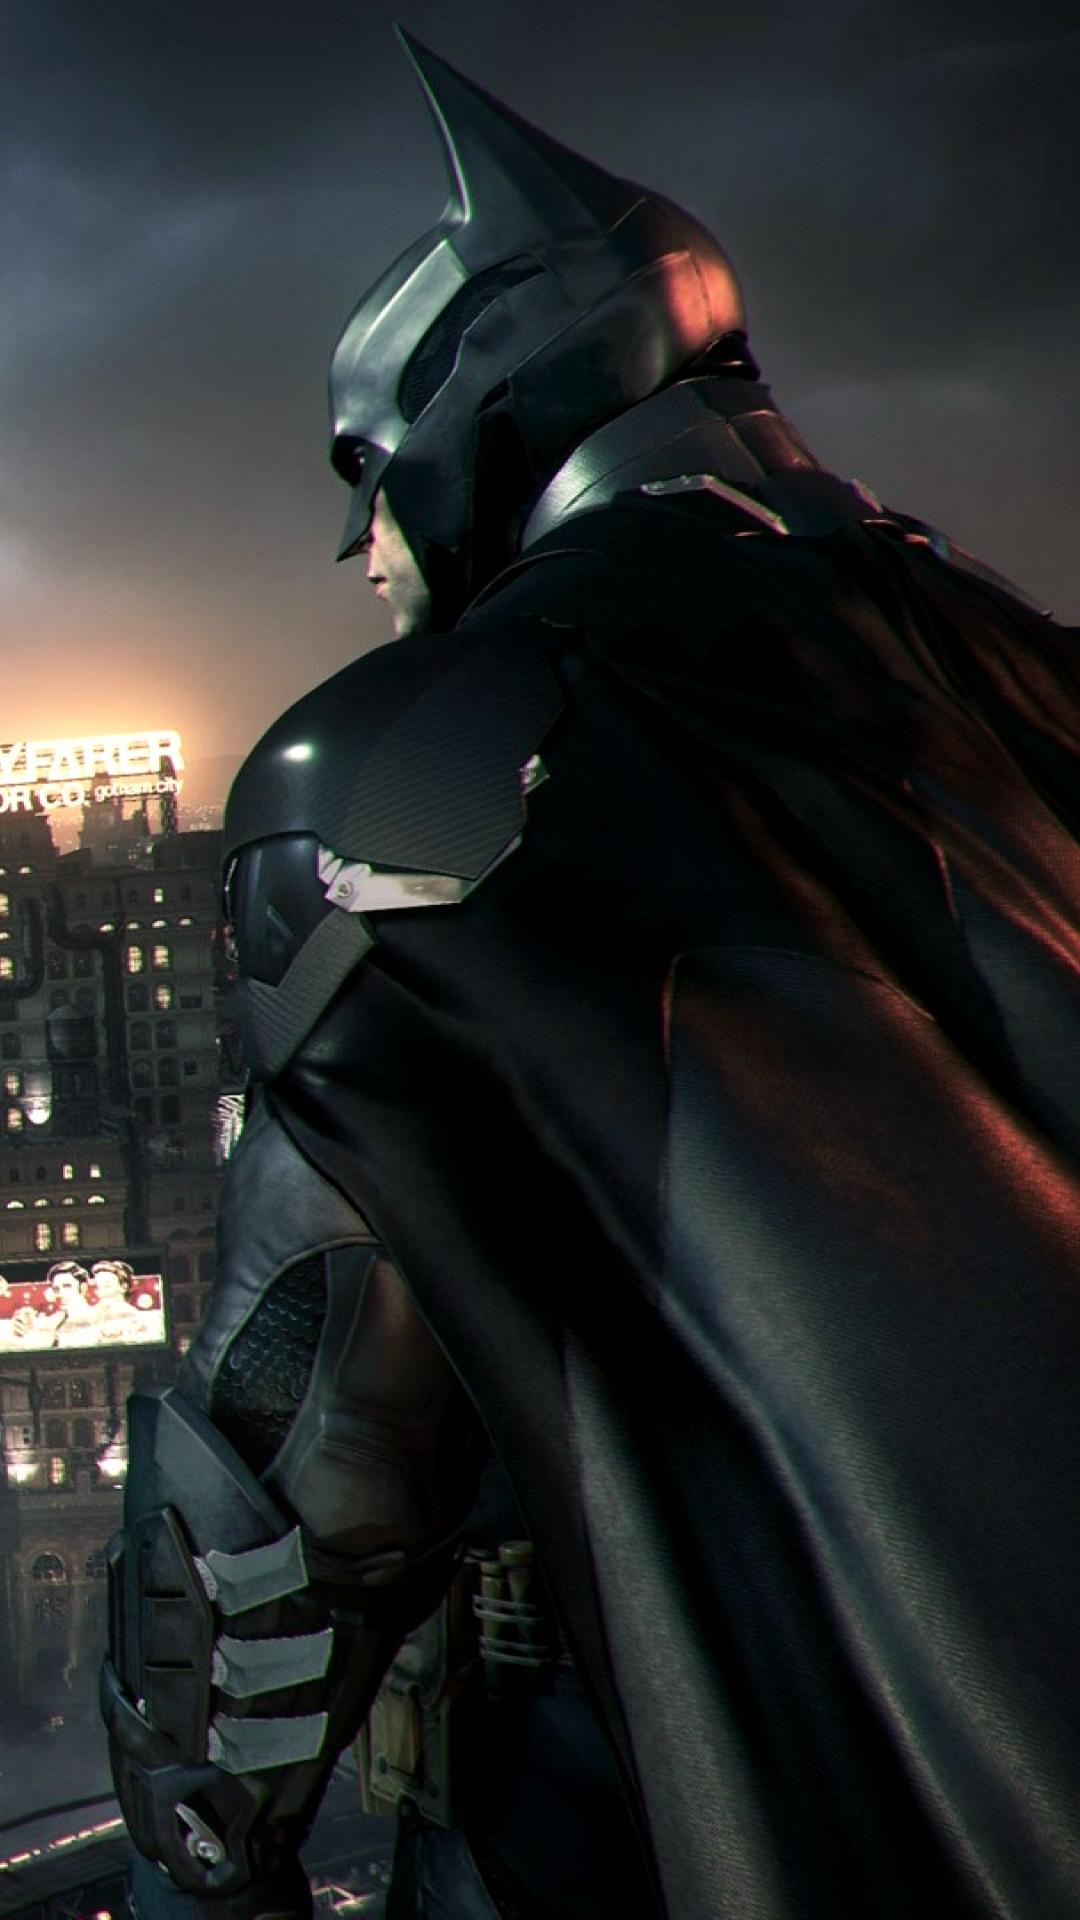 Iphone 5a Hd Wallpapers Batman Arkham Knight Wallpaper Hd 75 Images